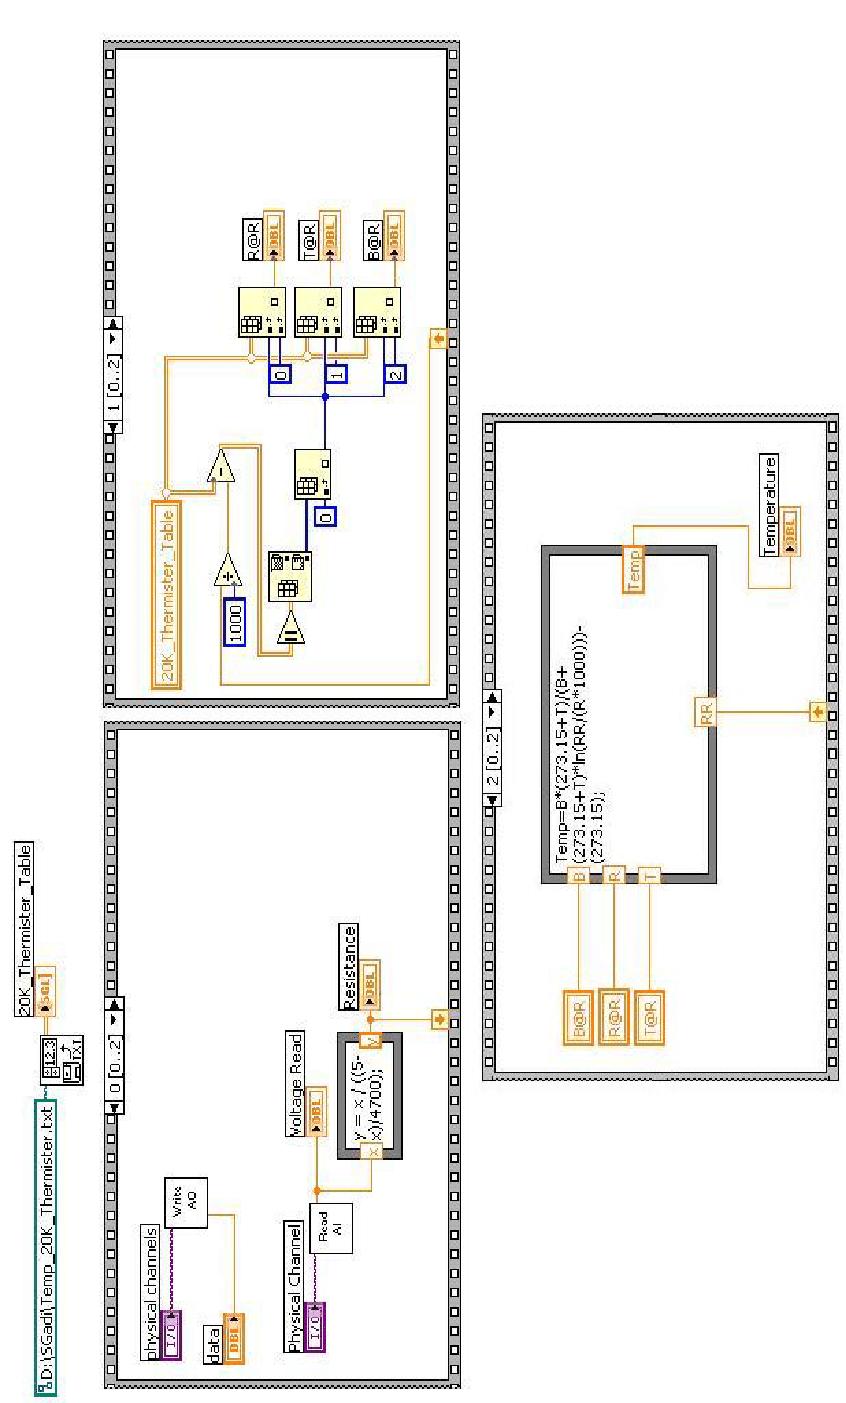 medium resolution of 5 labview block diagram showing temperature sensor calculations